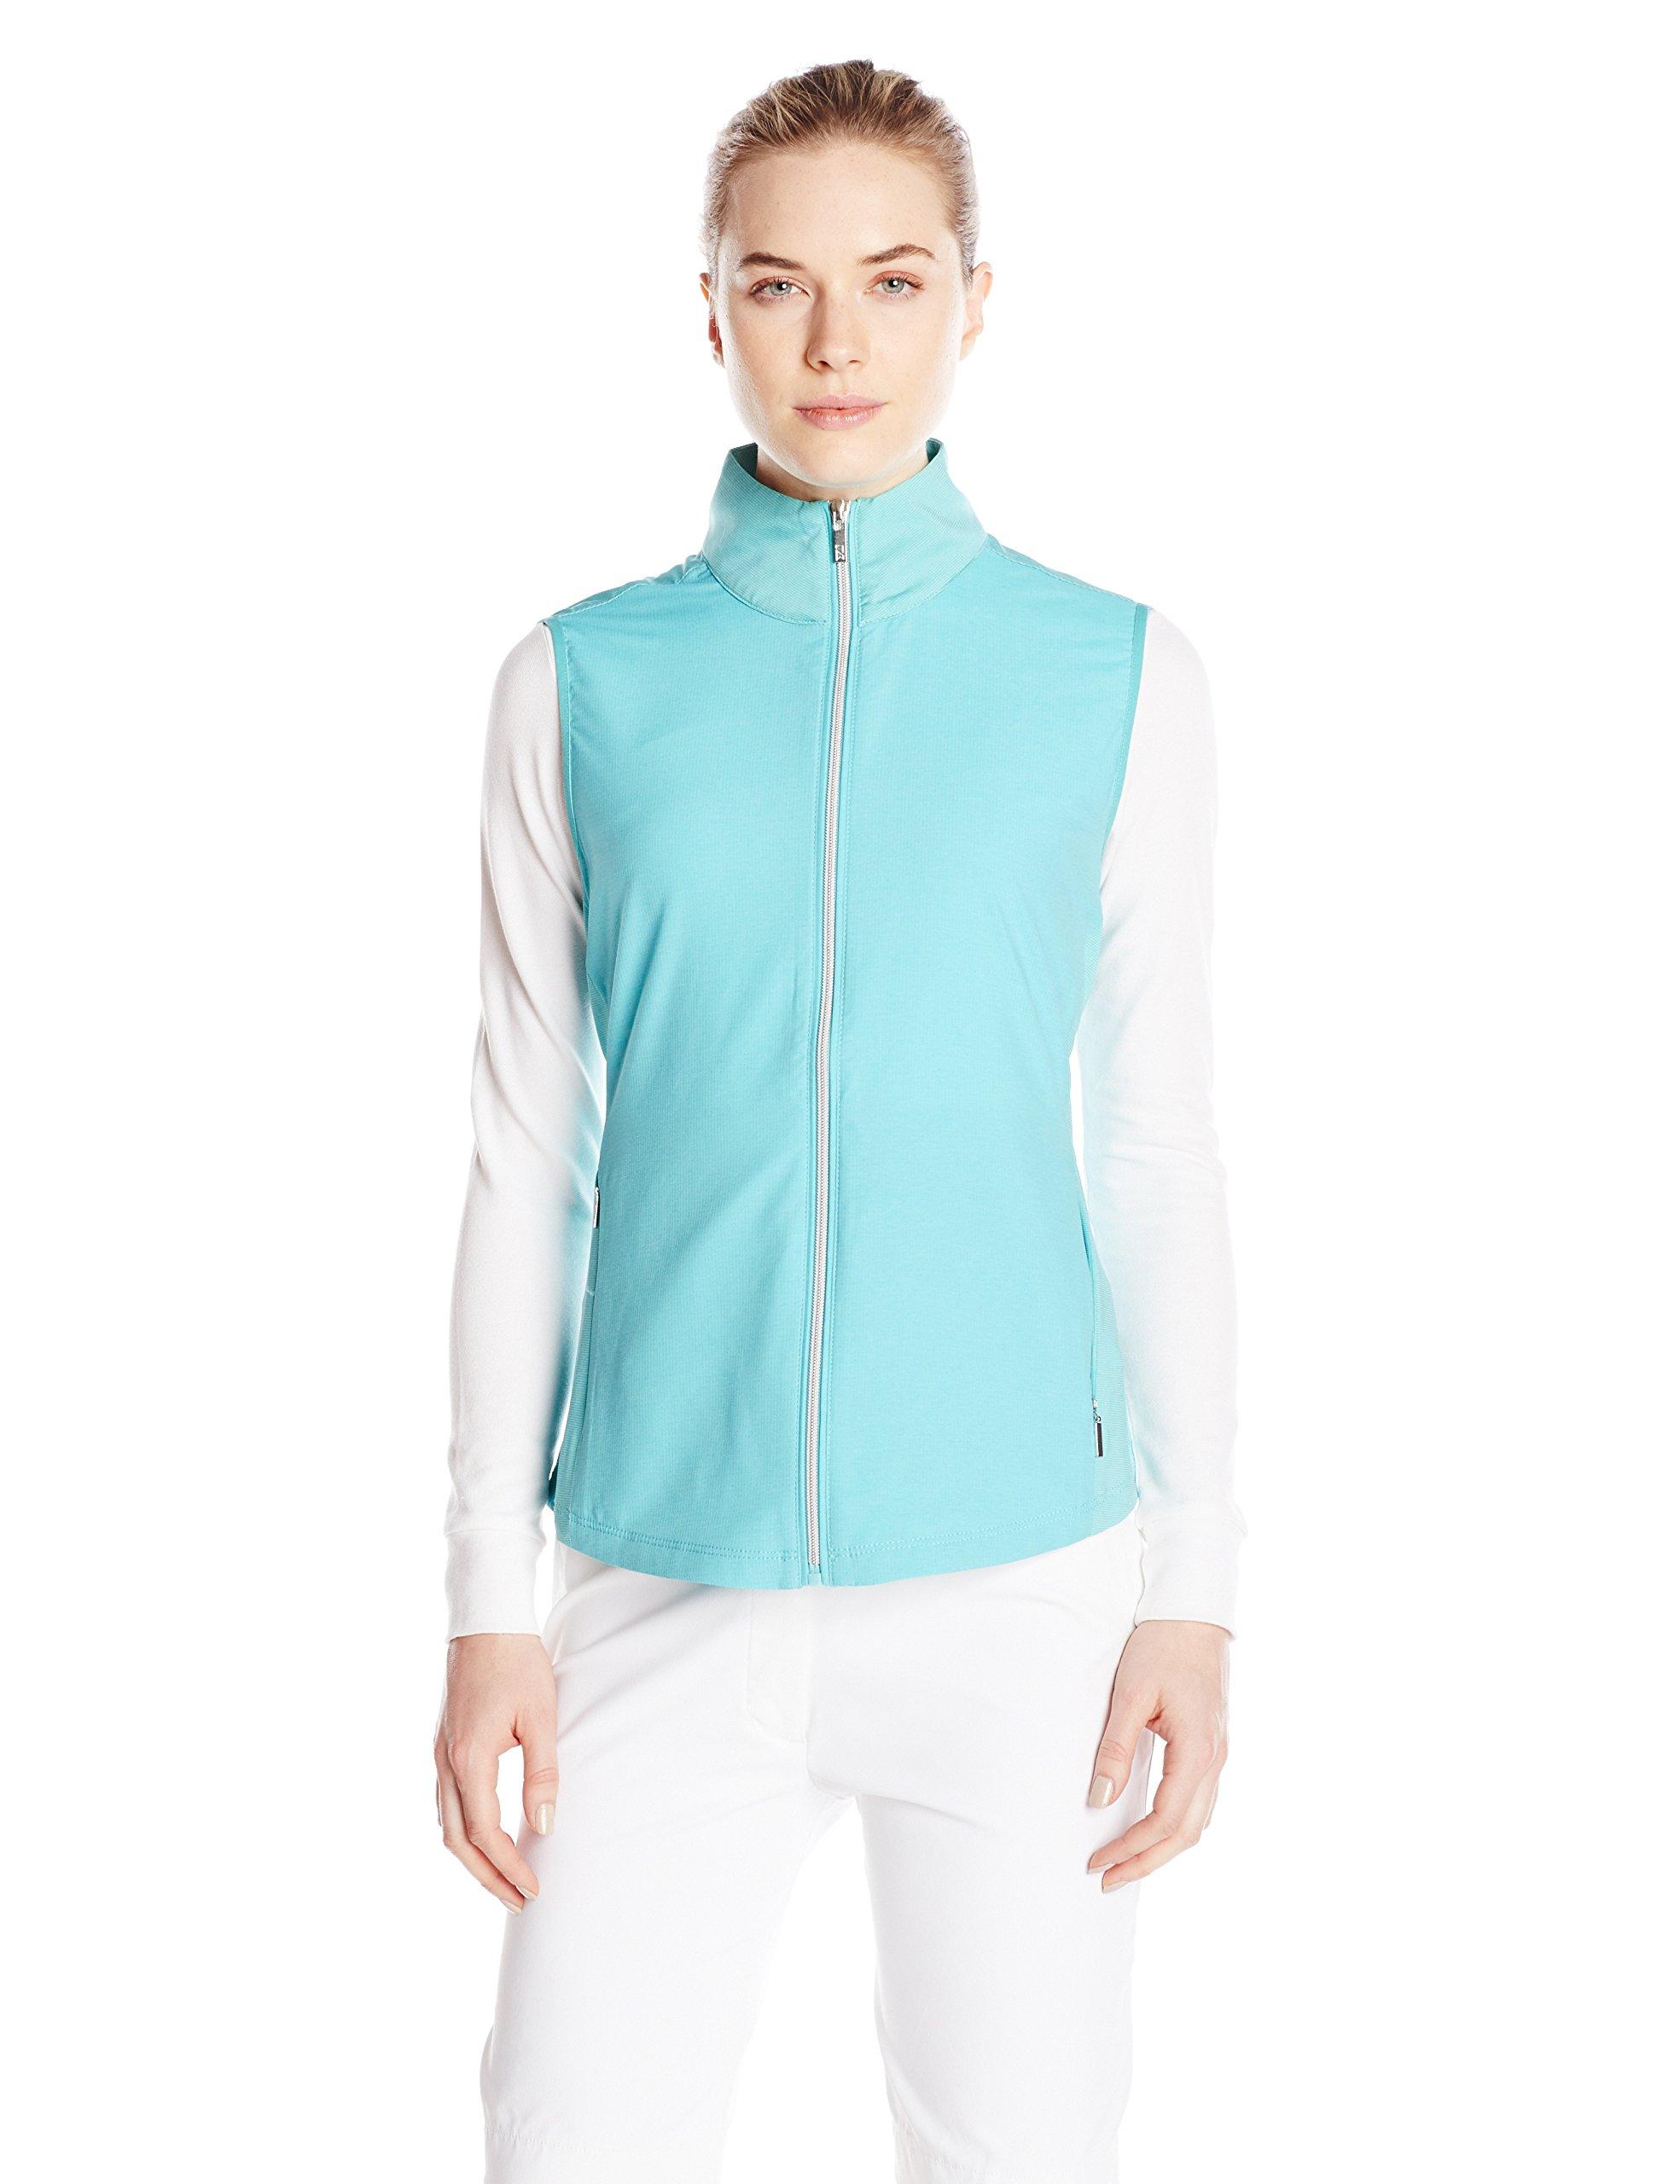 Cutter & Buck Women's CB Weathertec Laura Hybrid Vest, Quench, Small by Cutter